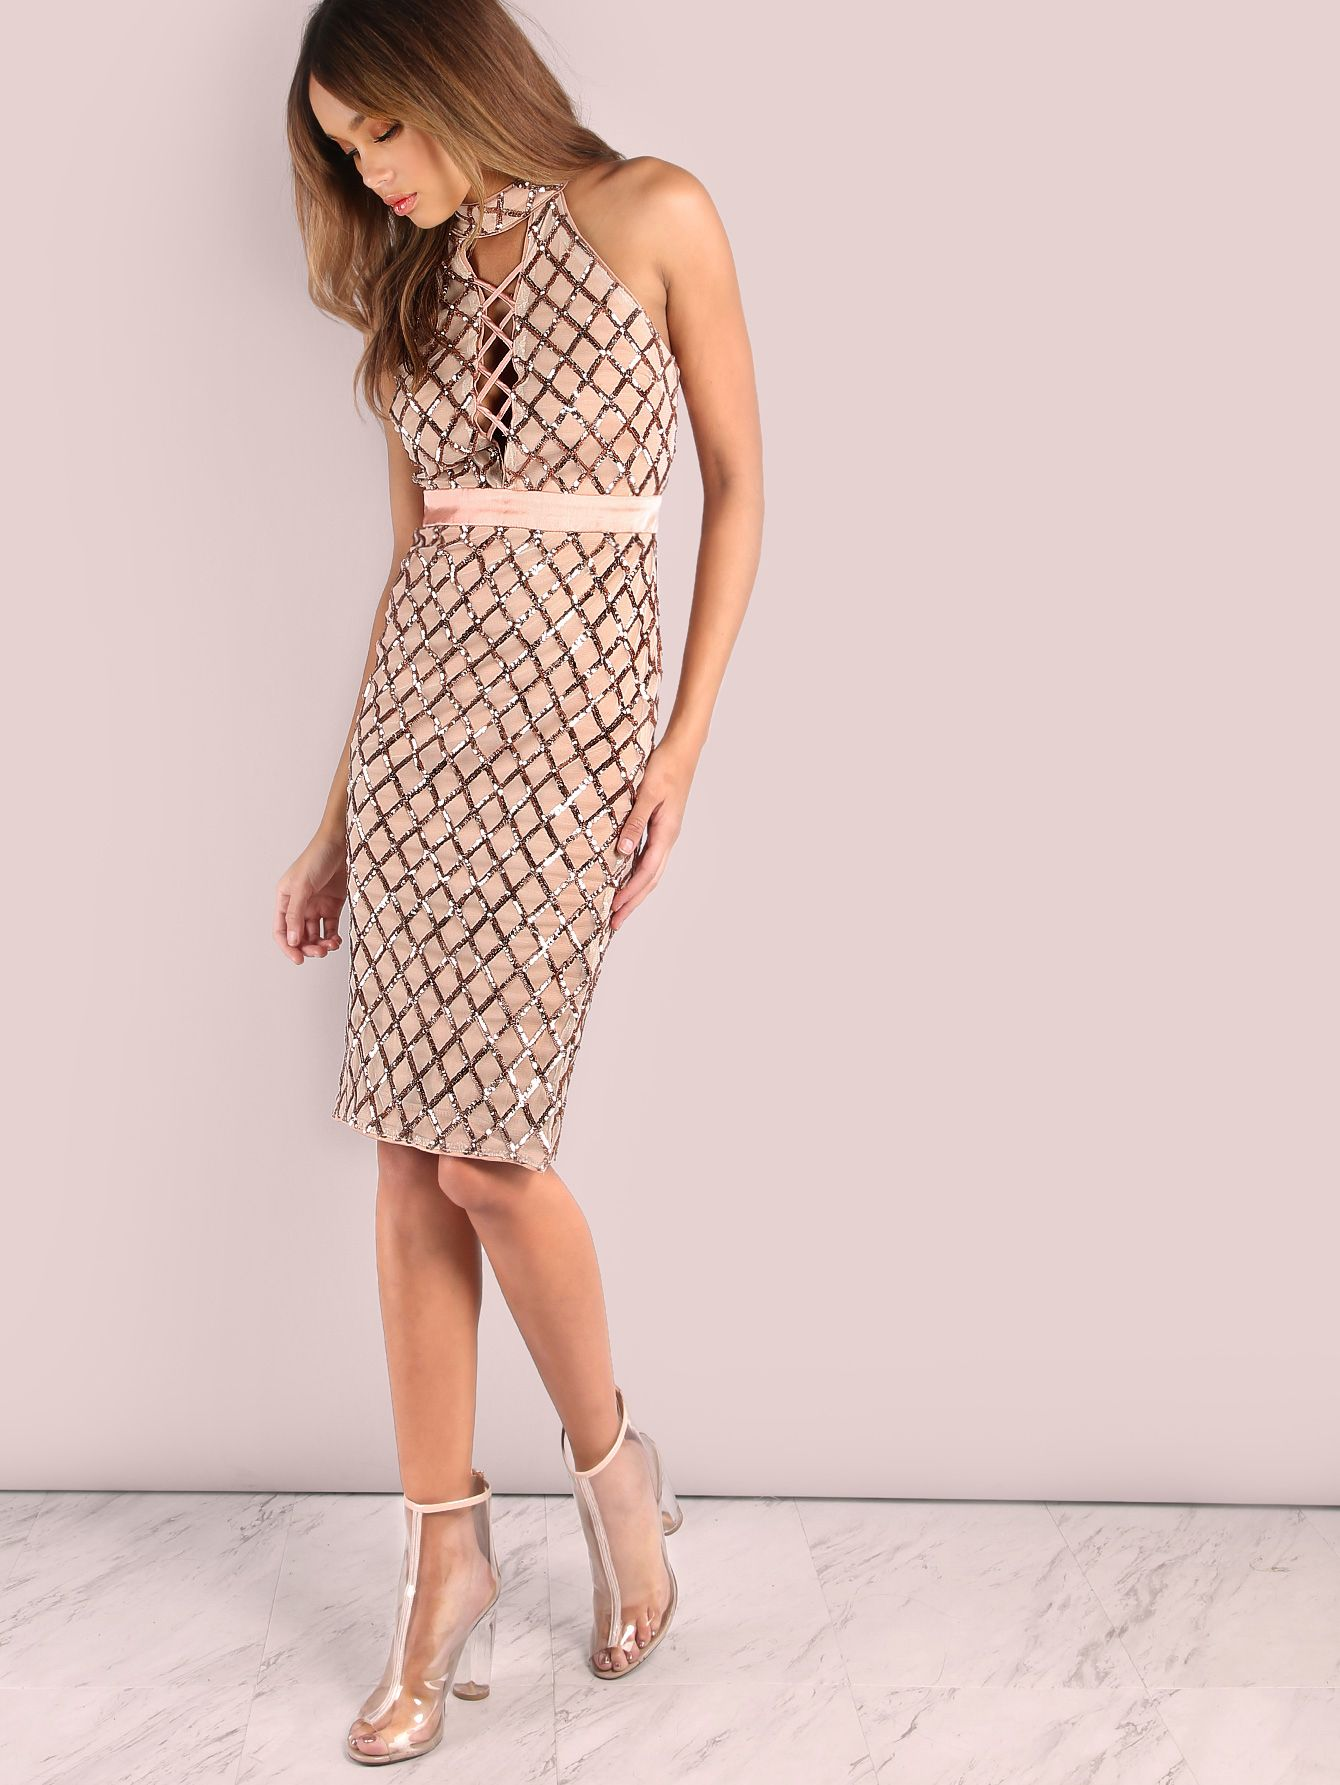 26c6a5fd25 Shop Cross Bust High Neck Sequin Midi Dress ROSE GOLD online. SheIn offers  Cross Bust High Neck Sequin Midi Dress ROSE GOLD   more to fit your  fashionable ...